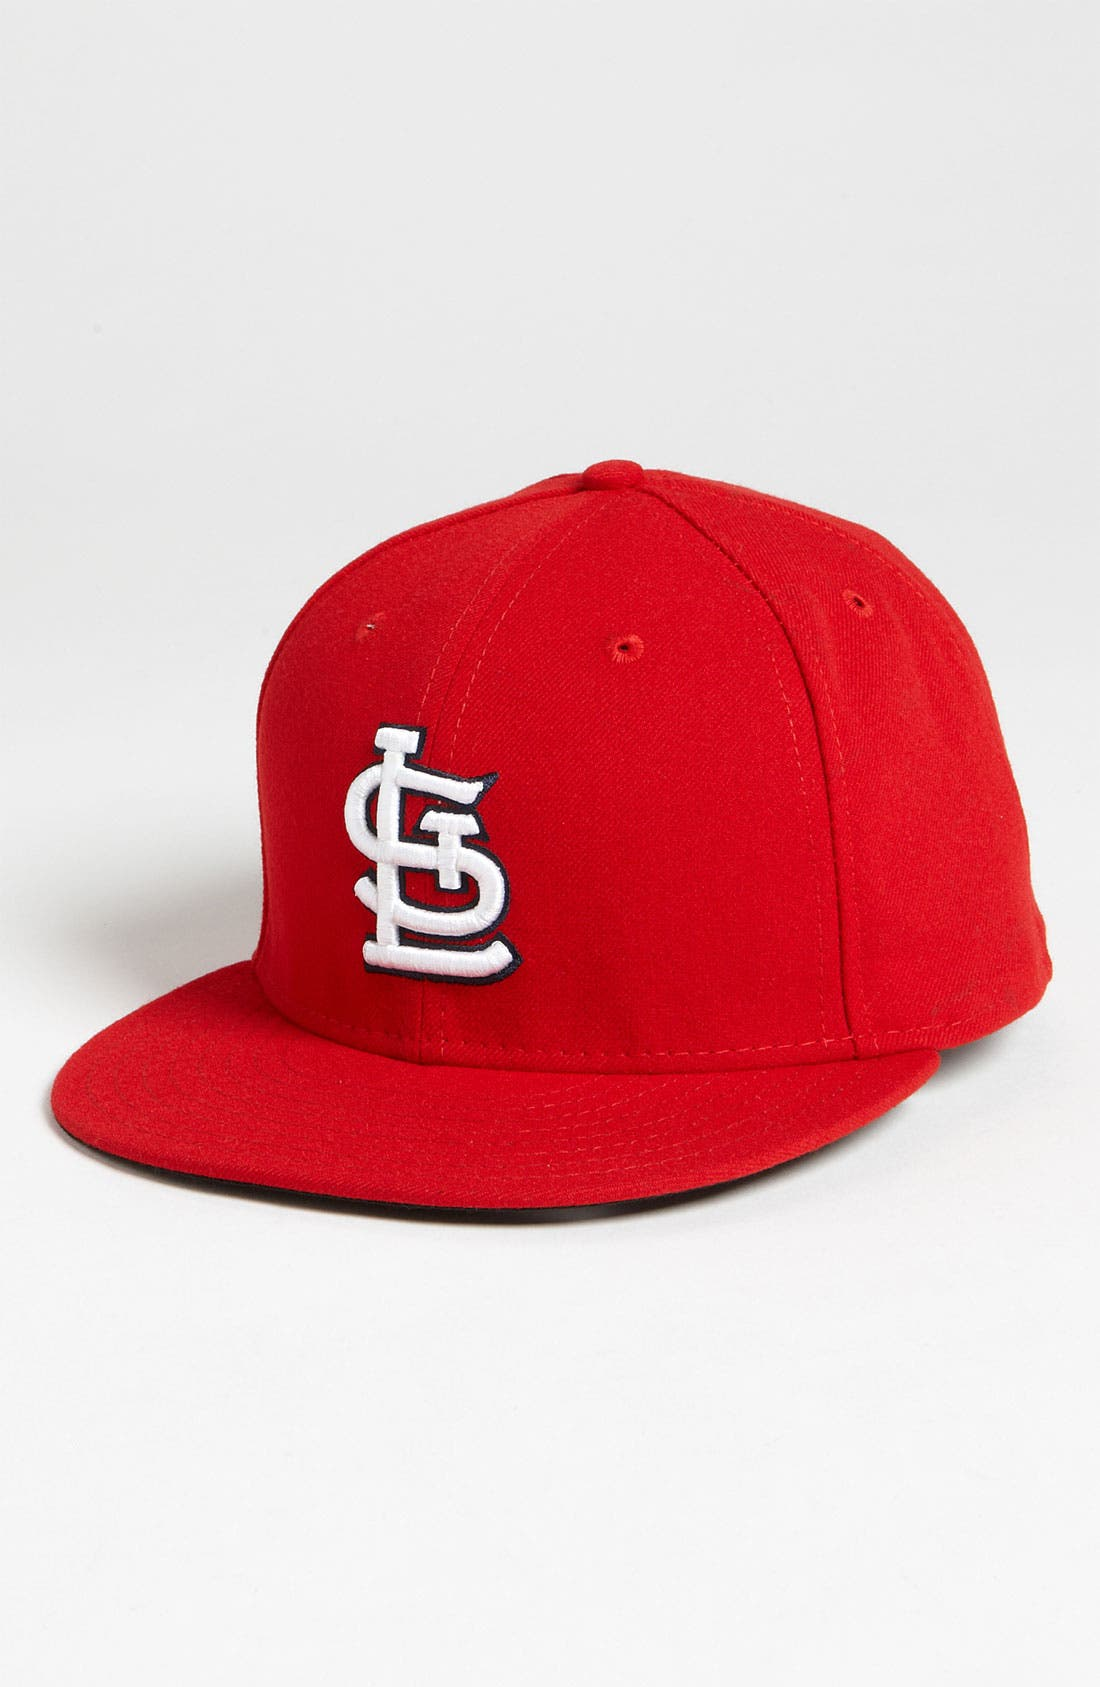 Main Image - New Era Cap 'St. Louis Cardinals' Baseball Cap